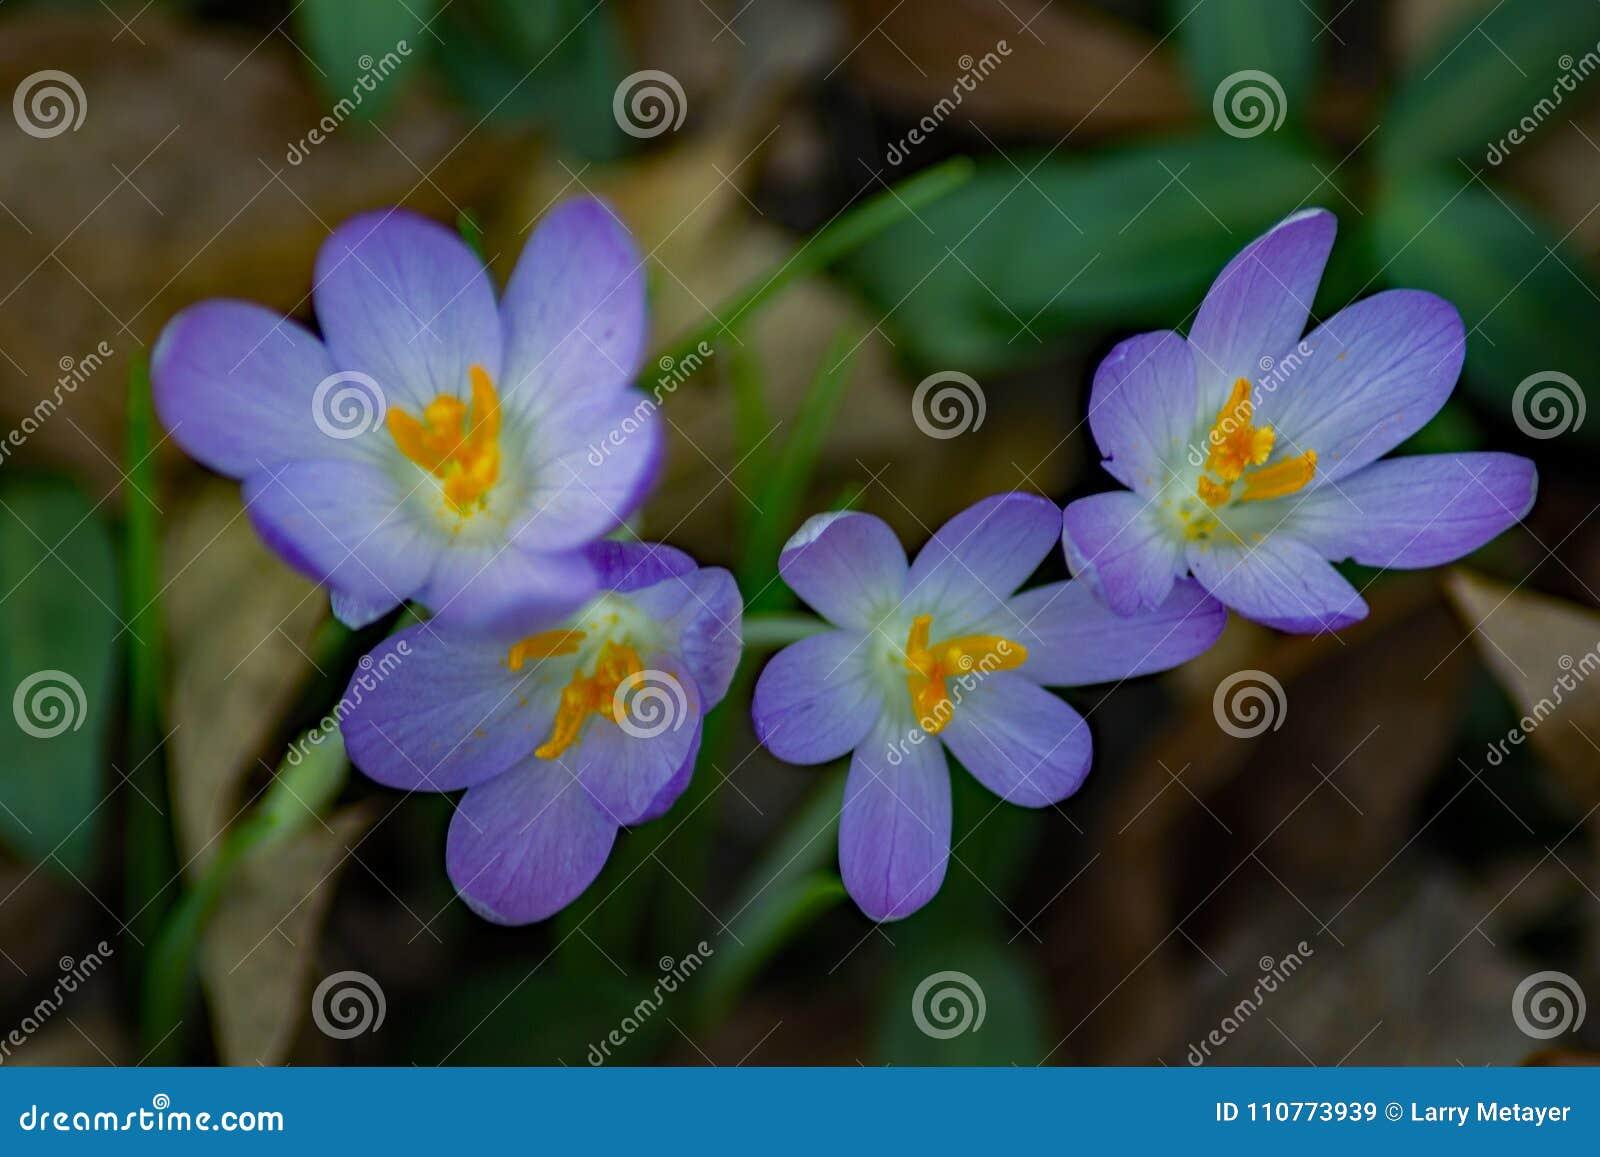 Crocus First Flower Of Spring Group Stock Image Image Of Dark